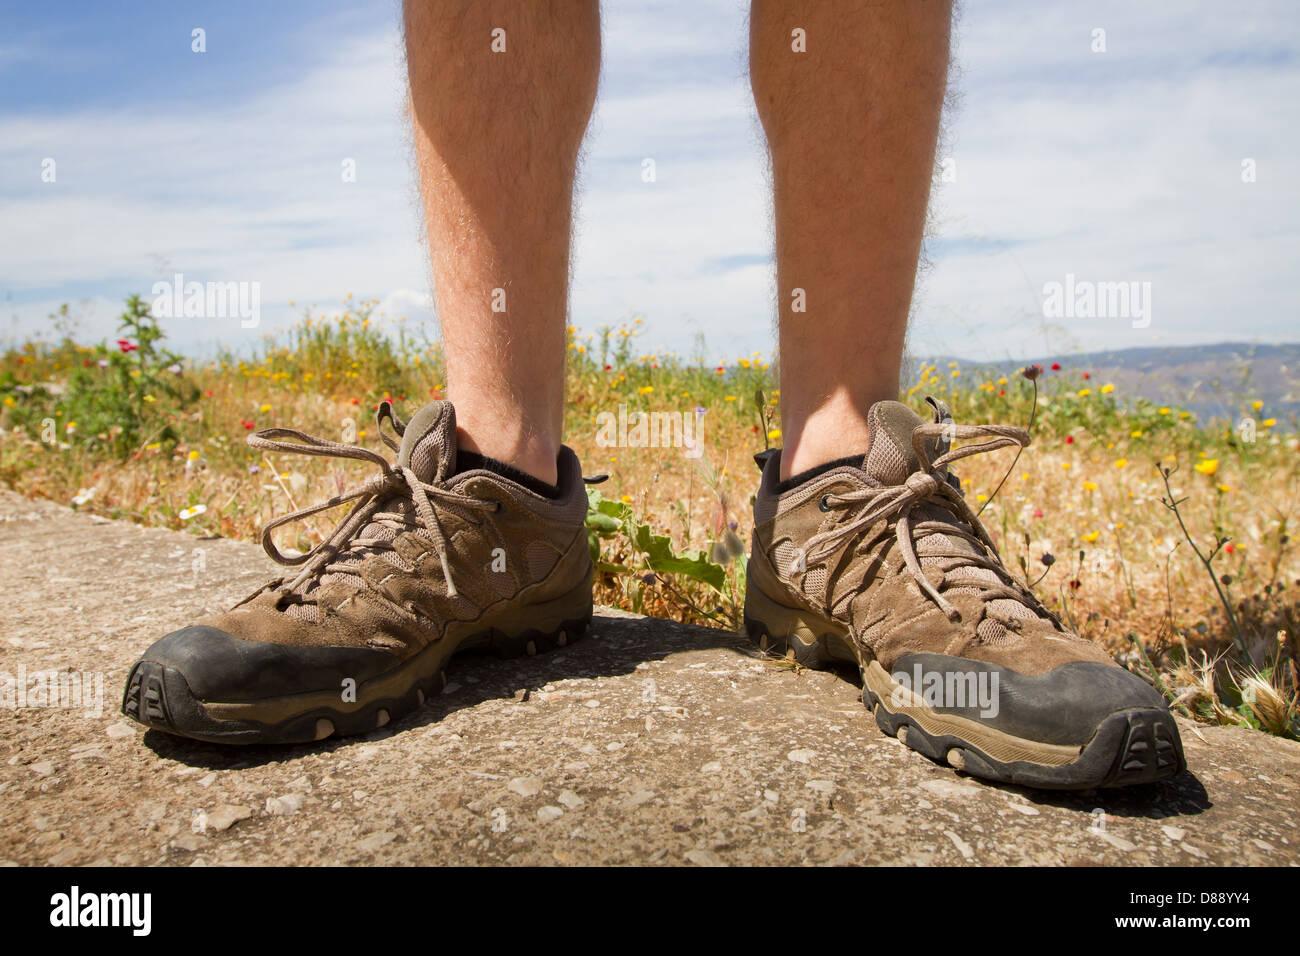 Trekking Schuhe outdoor, Beine der Wanderer Stockbild